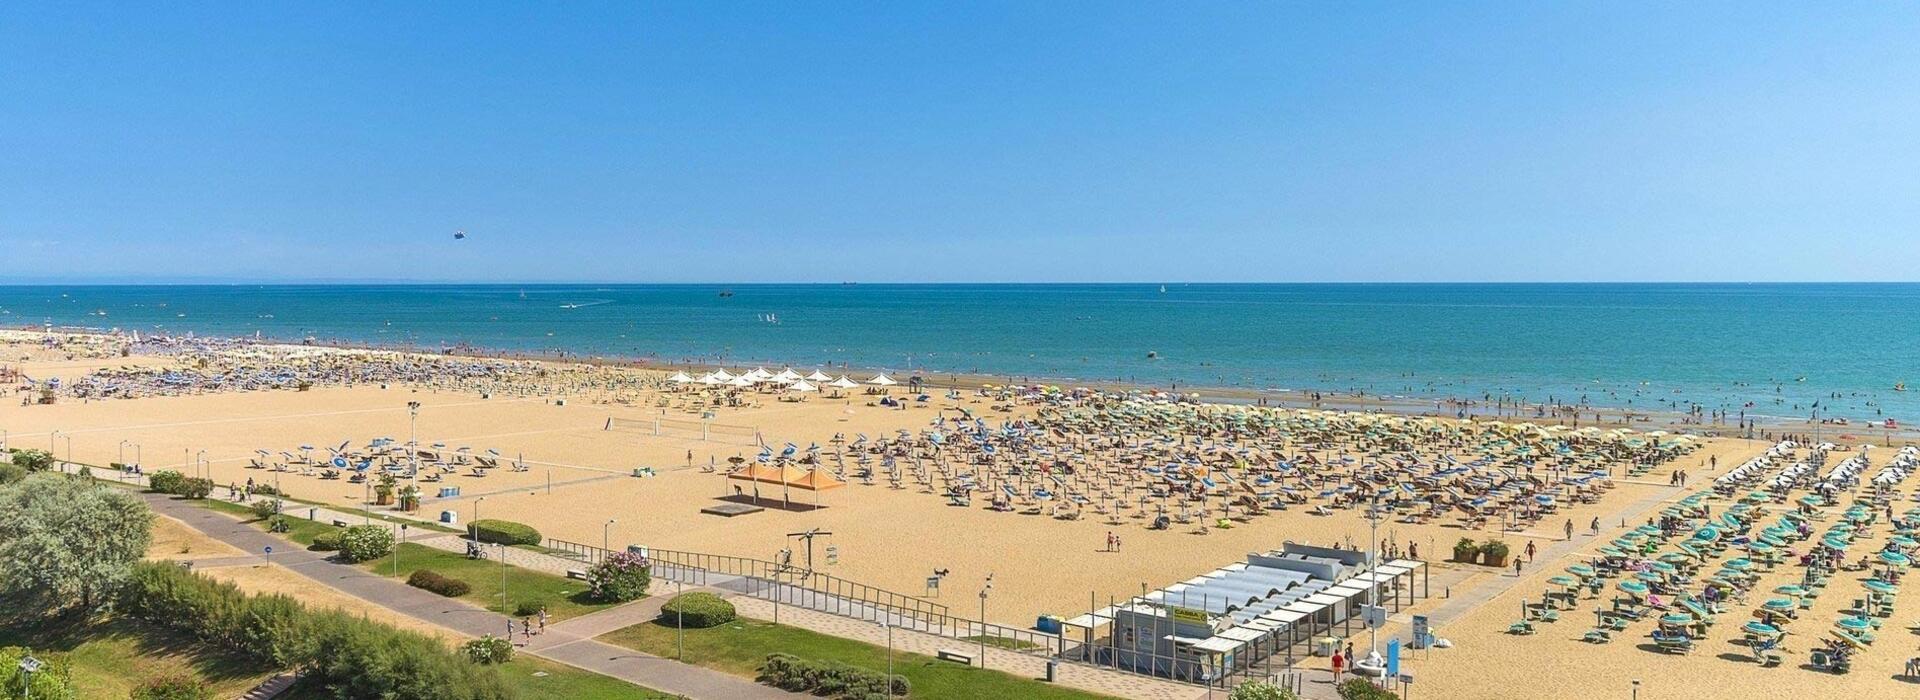 hotelvictoria en sea-side-and-sand-beaches 015